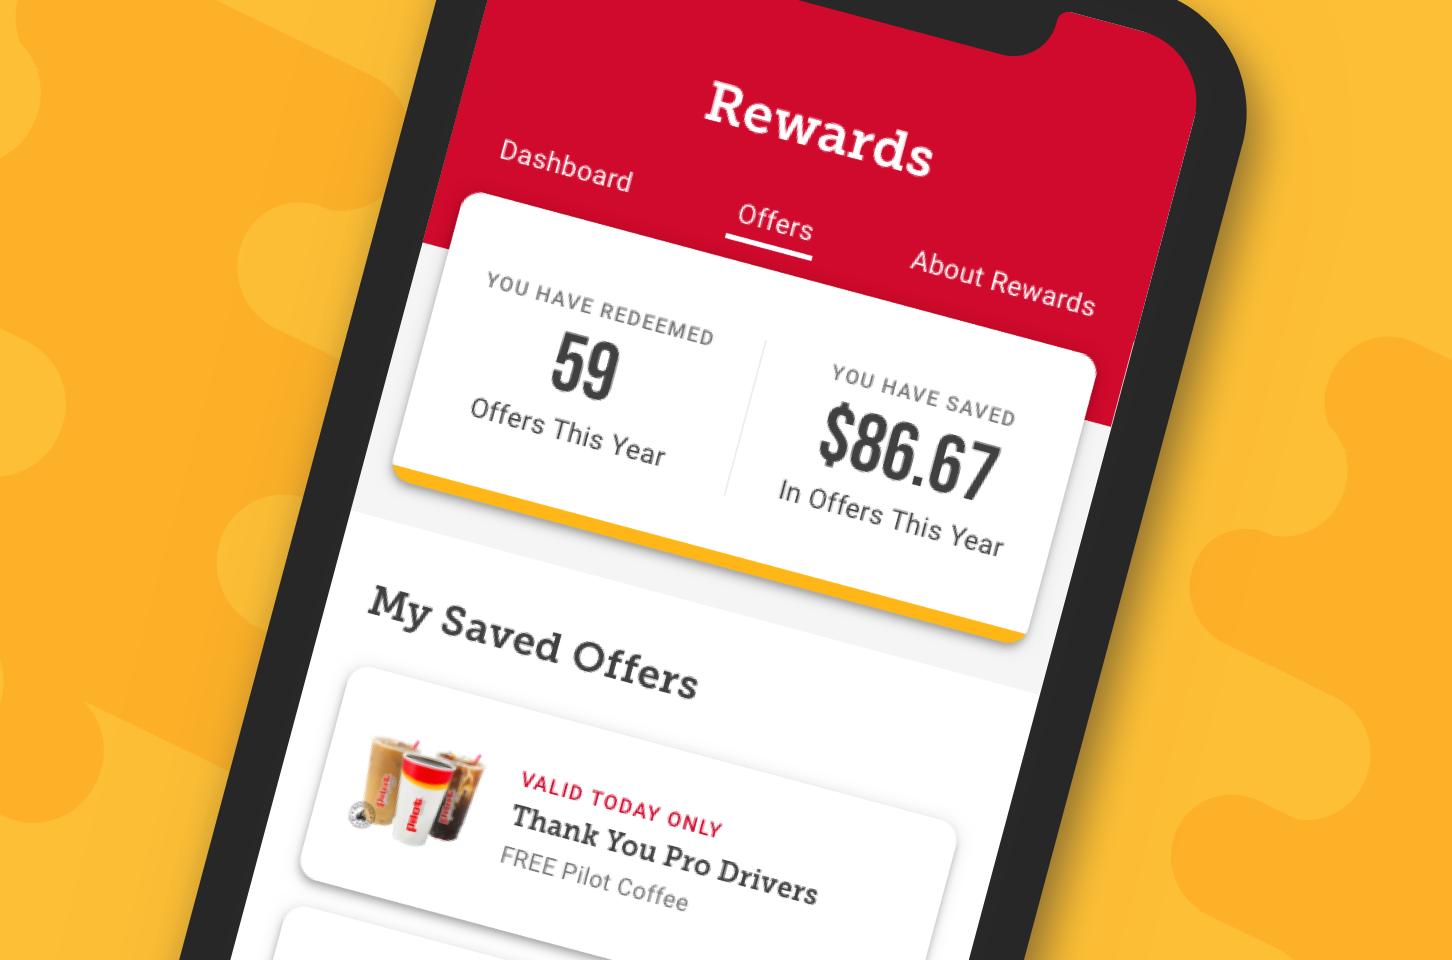 Big rig drivers deserve big rewards. The myRewards Plus™ app is delivering the goods with more rewards, free drinks and bonus points all September for Driver Appreciation month.